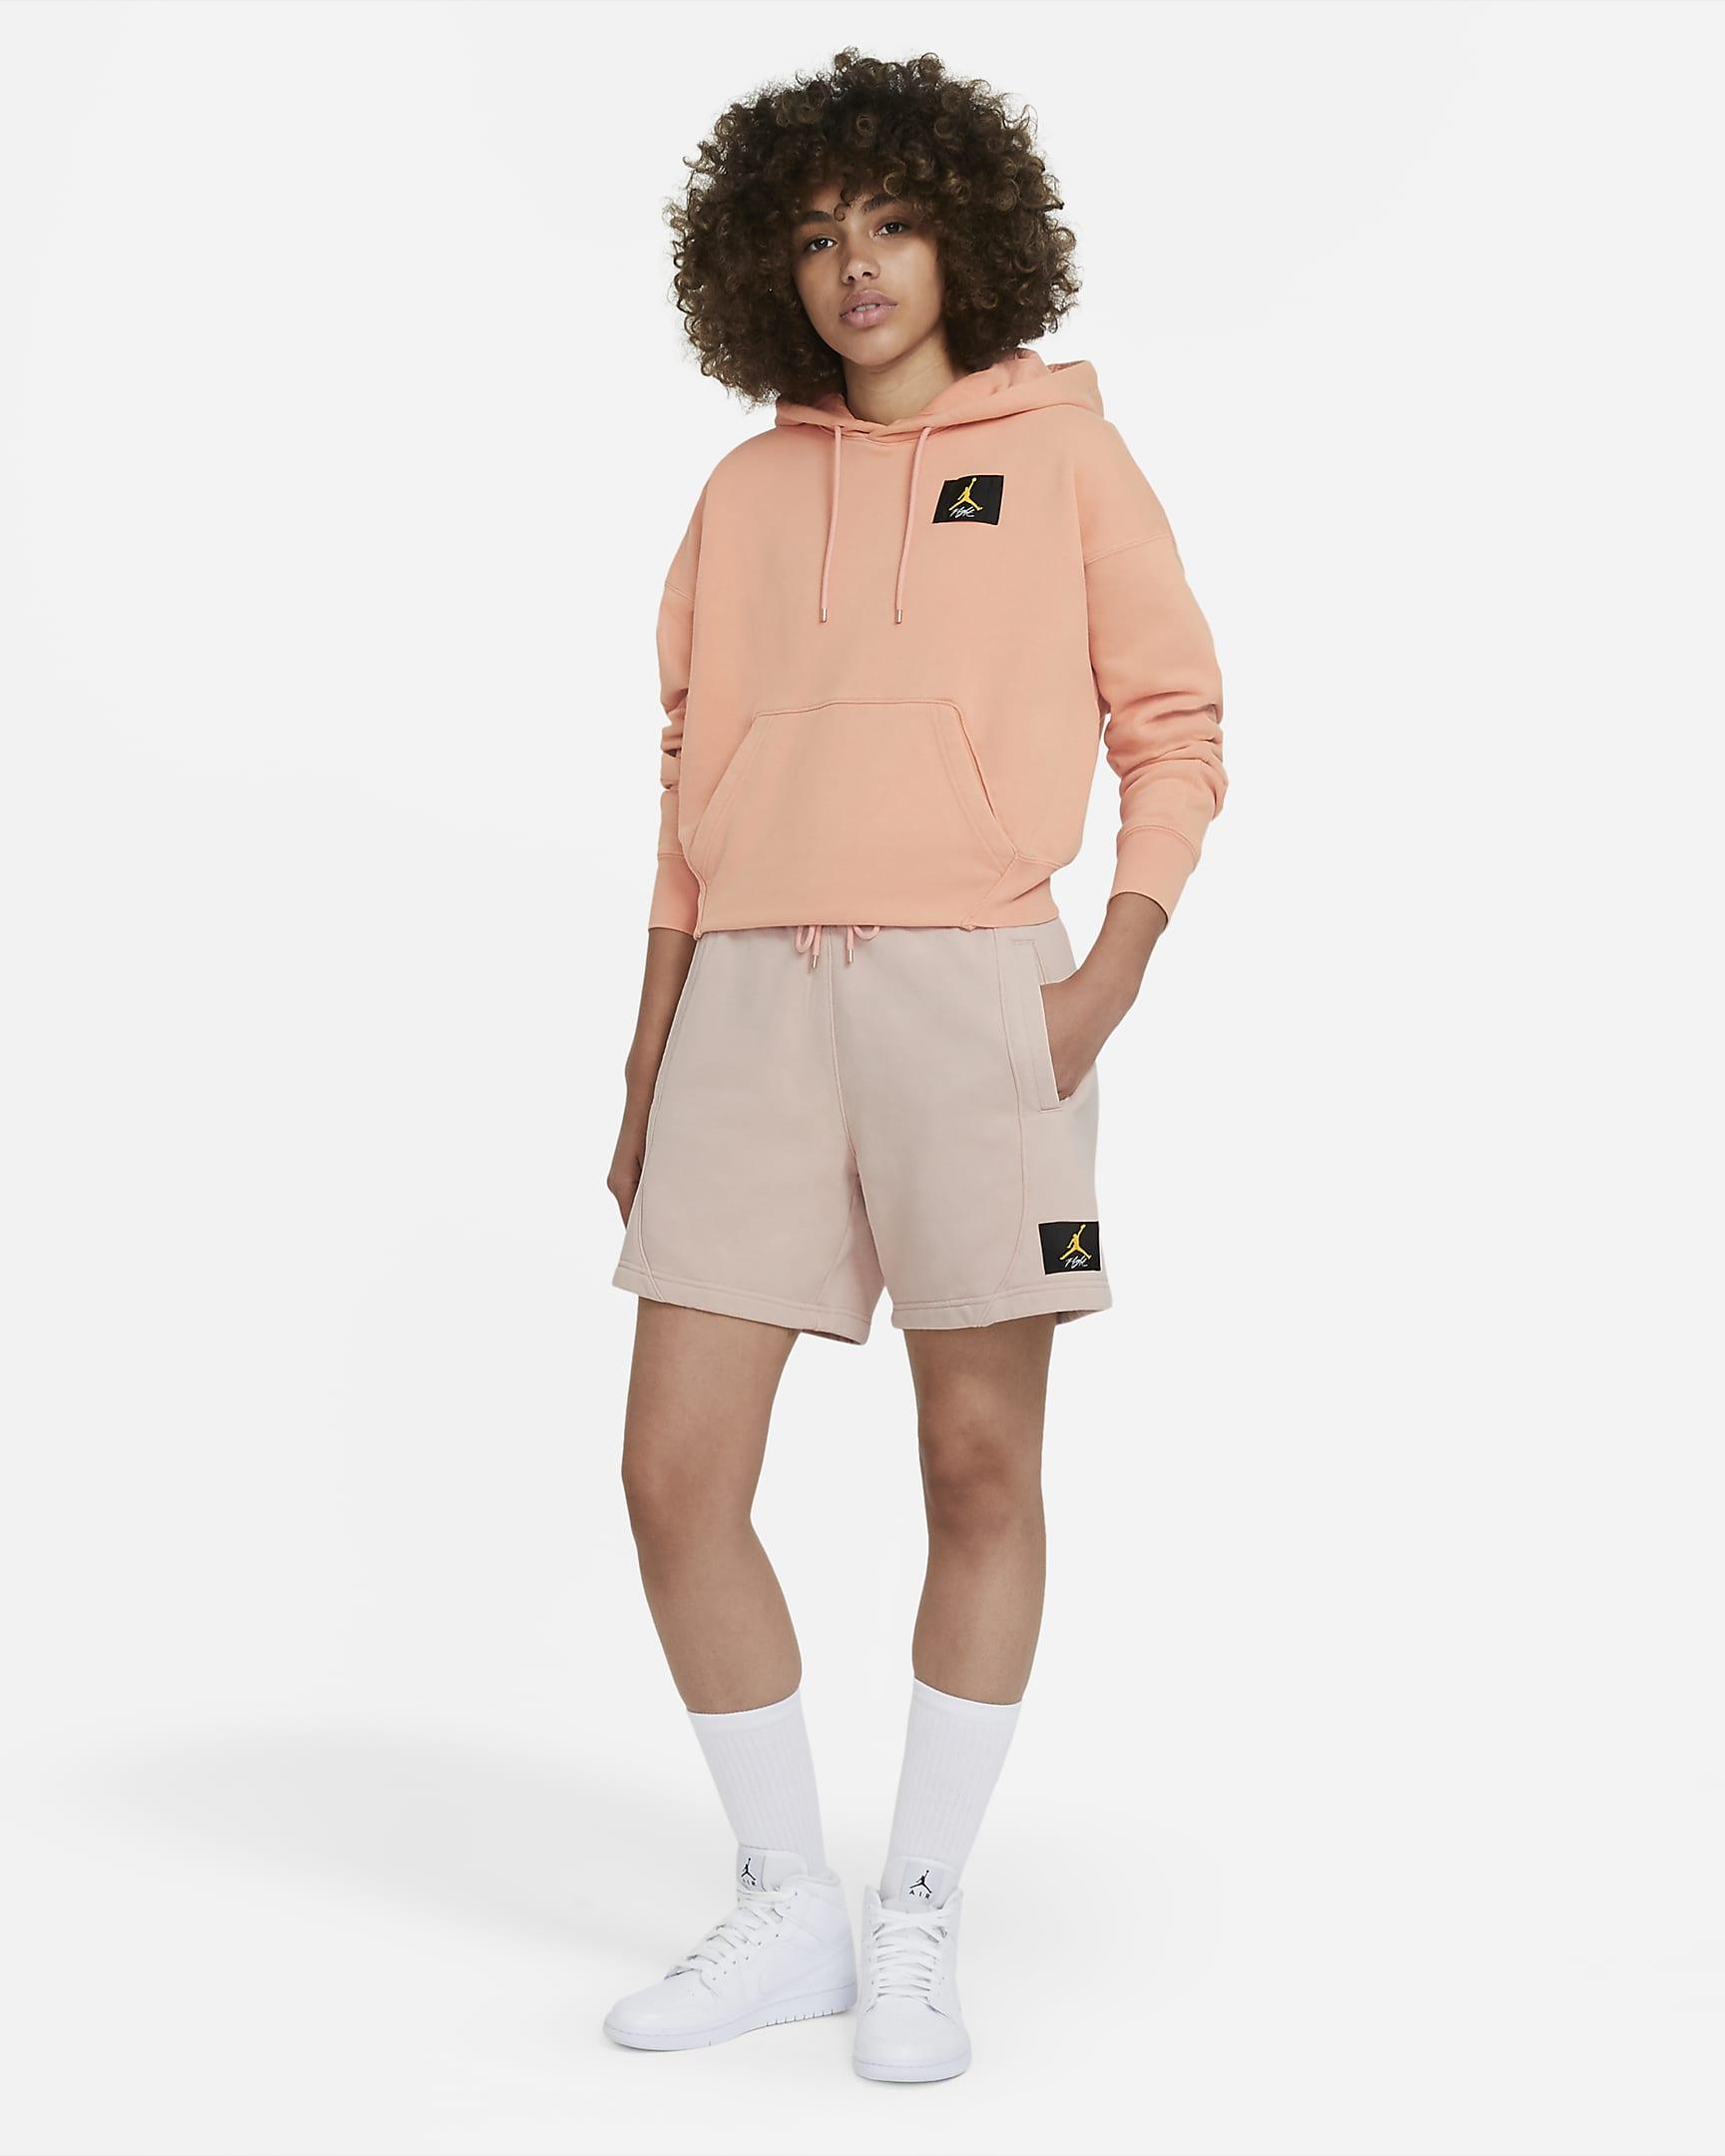 jordan-flight-womens-fleece-shorts-zDGn42-3